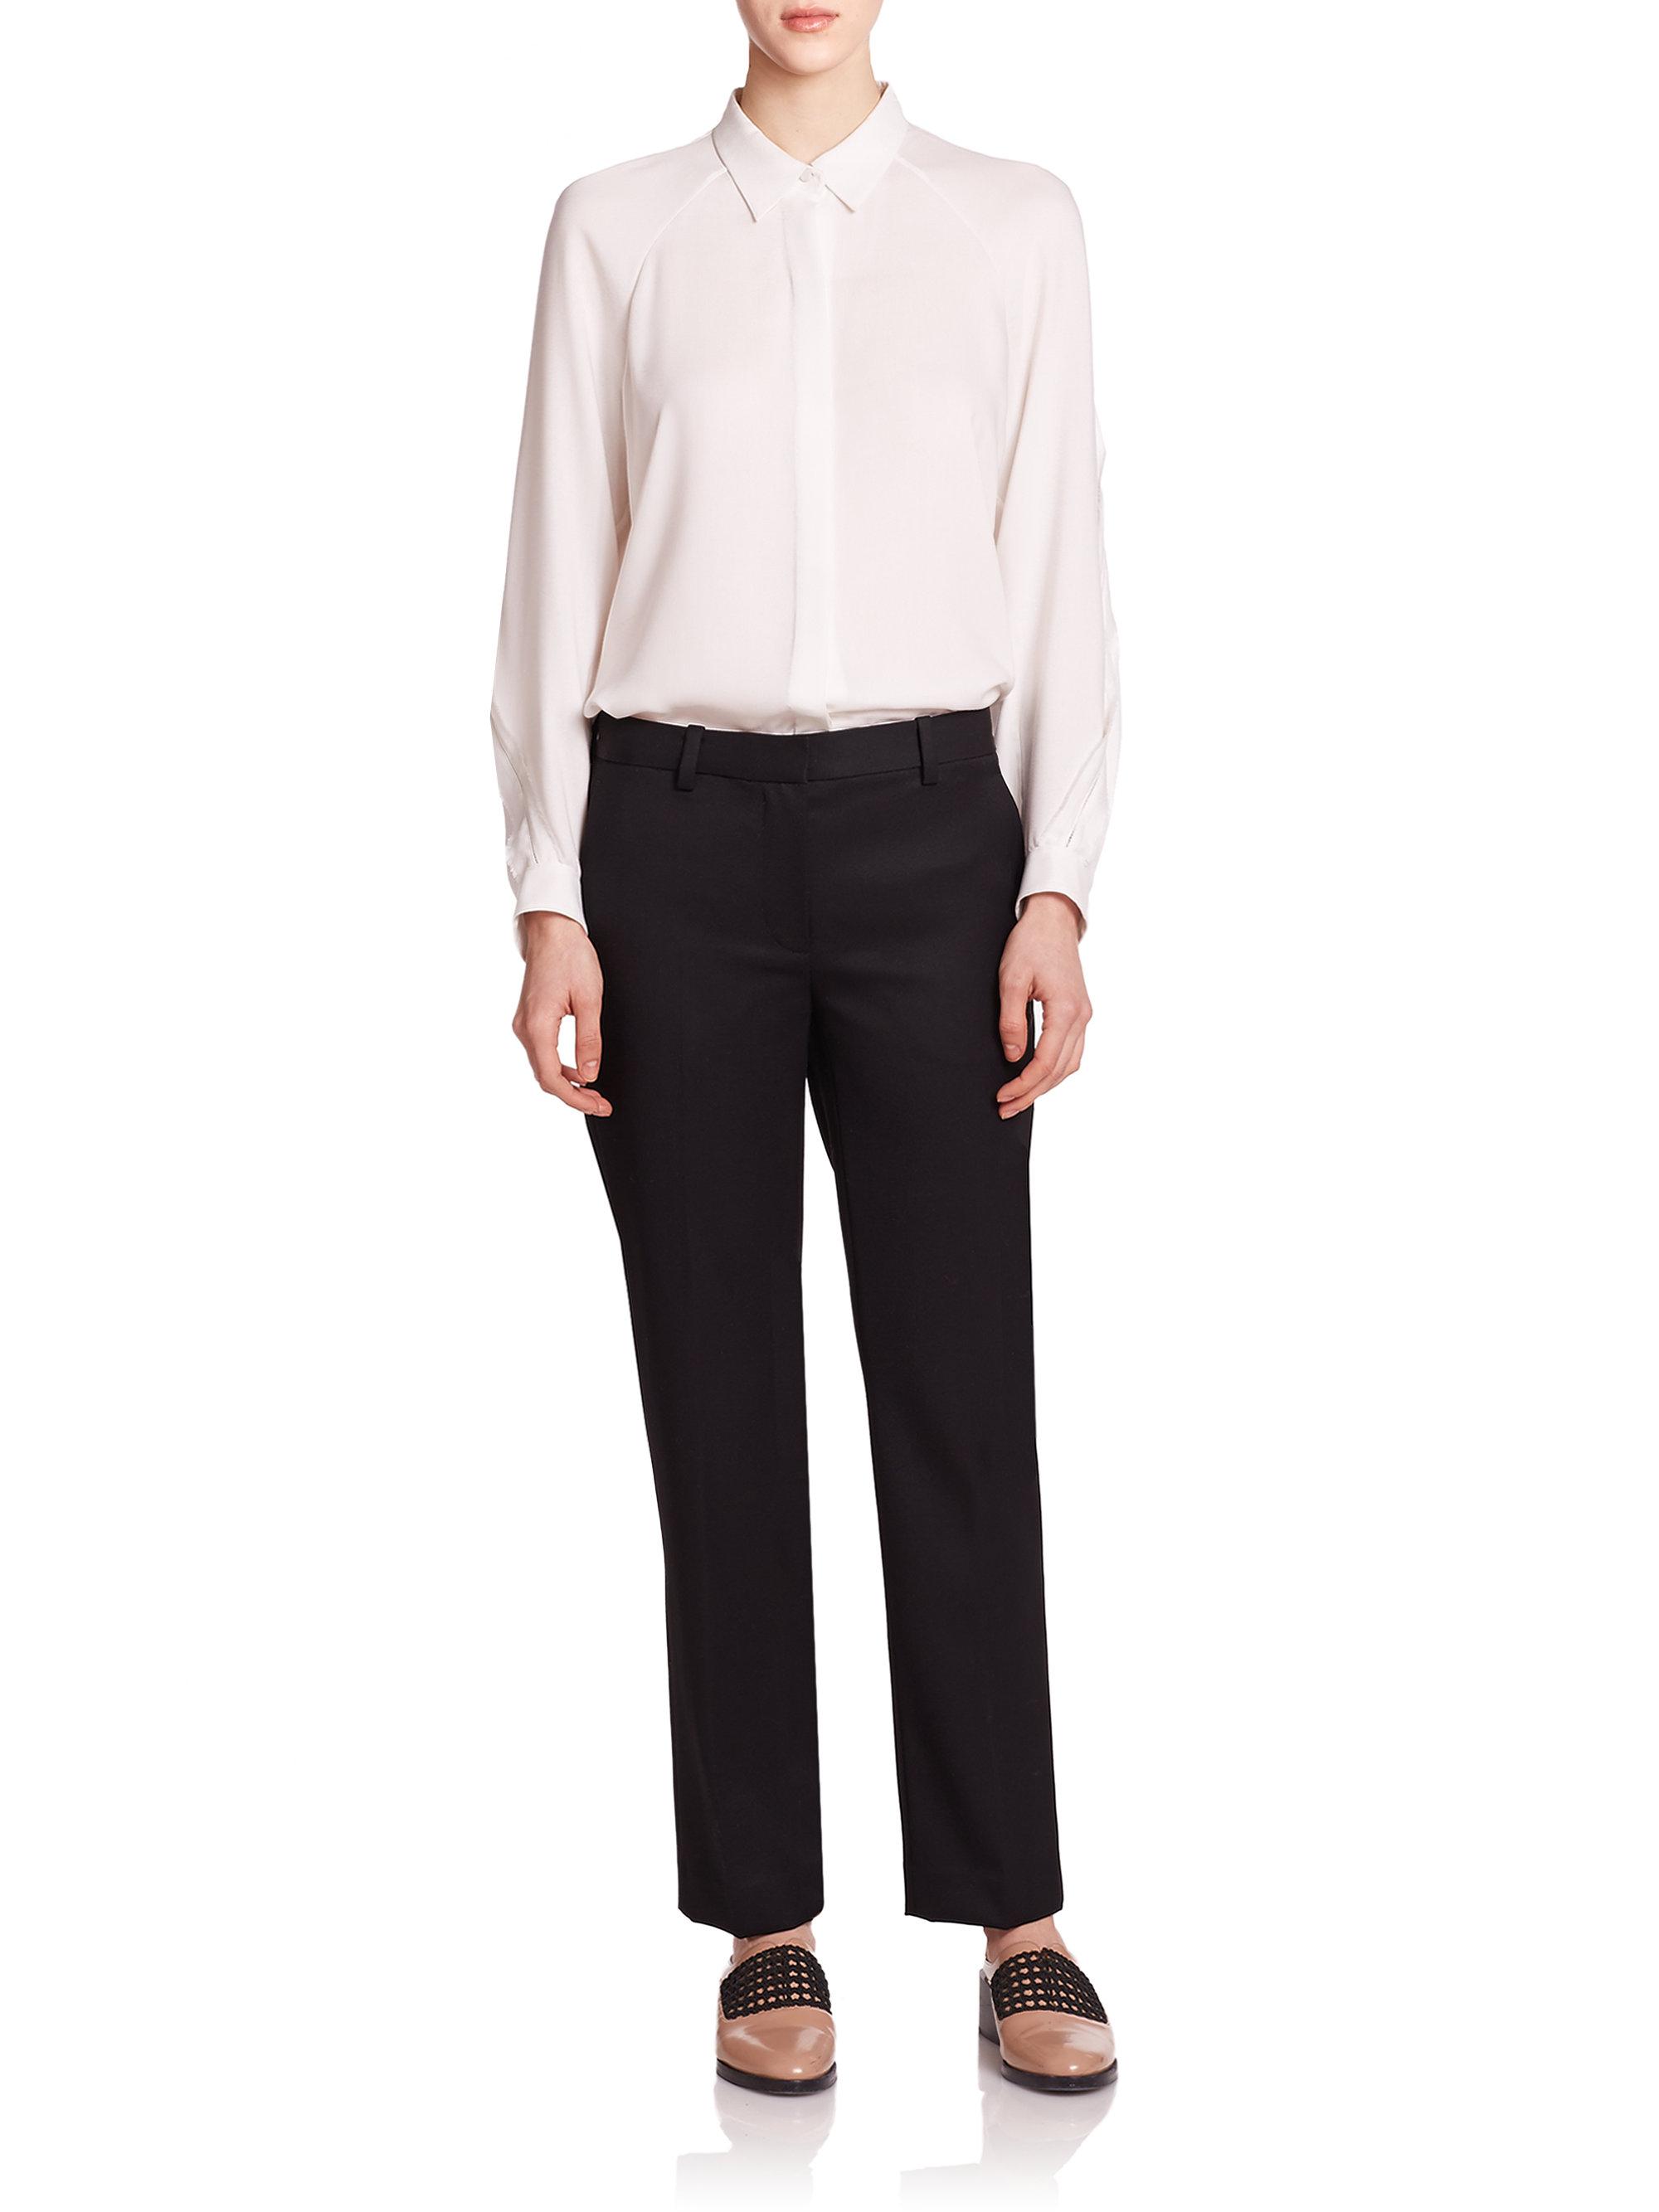 3.1 phillip lim Wool Pencil Pants in Black   Lyst